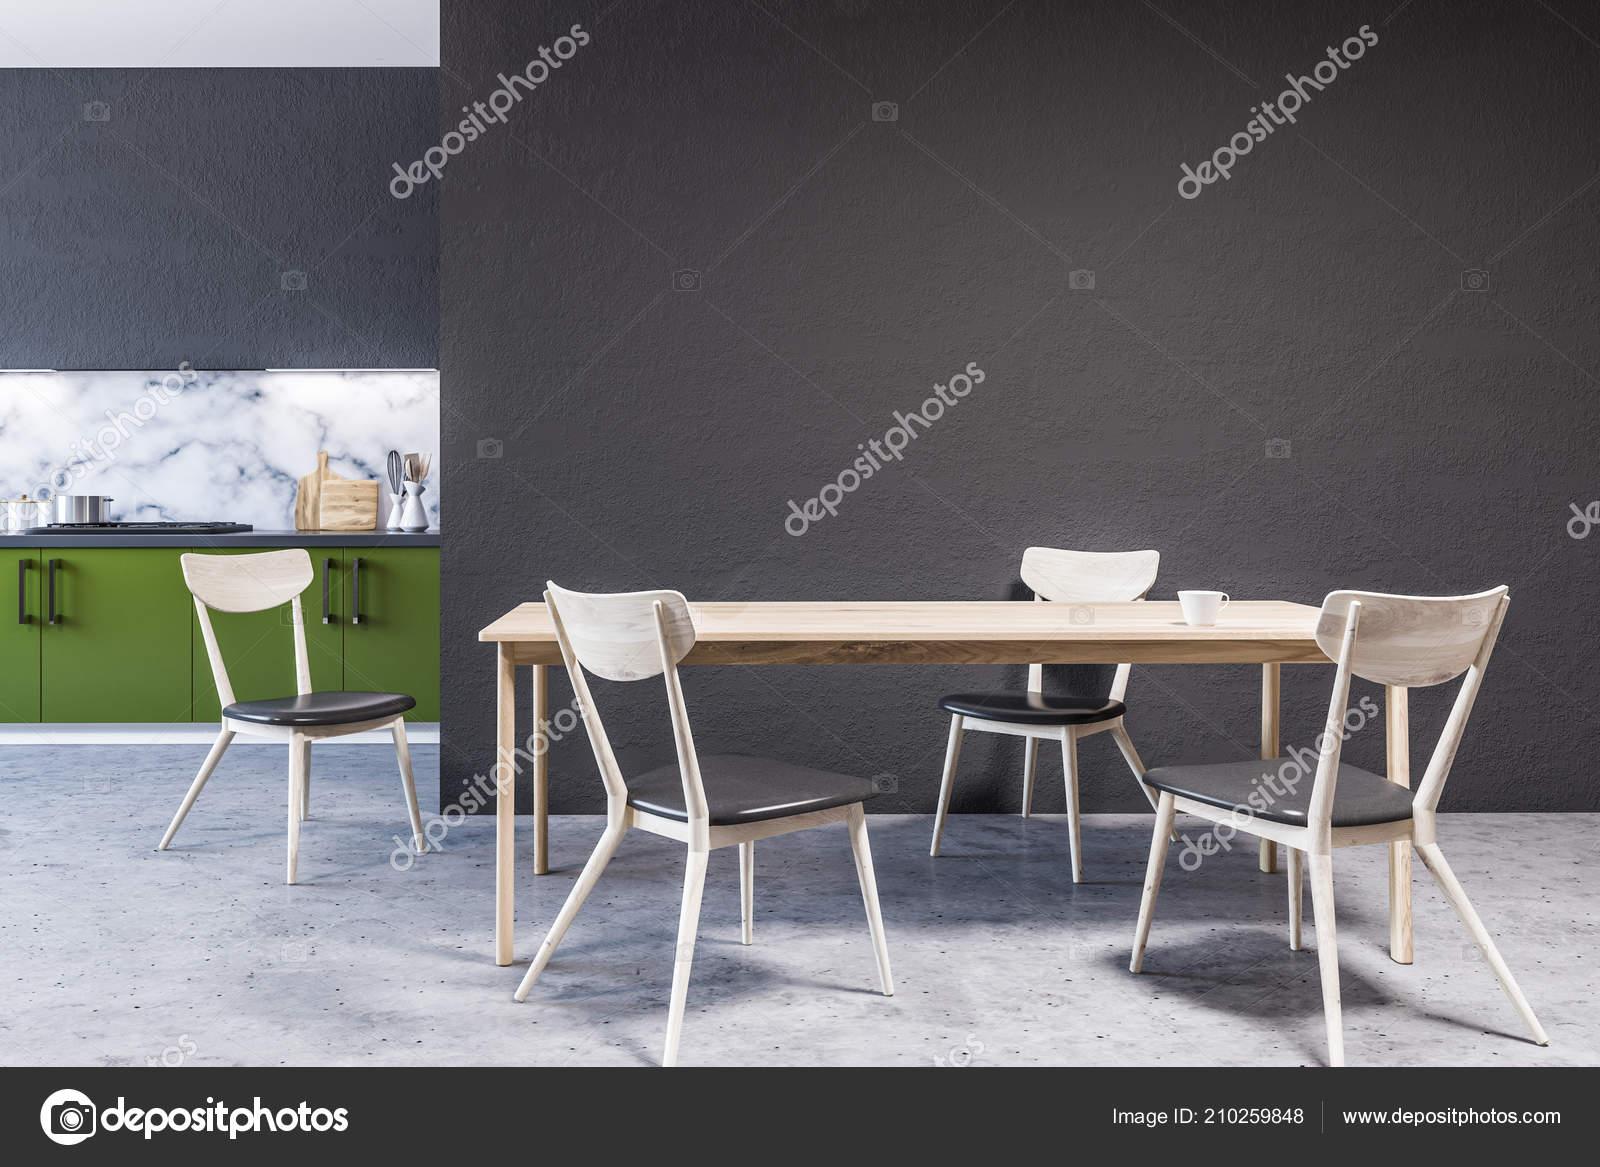 built in kitchen table chairs 现代大理石墙厨房内部的大窗户混凝土地板和绿色的台面与内置的家电有椅子 现代大理石墙厨房内部的大窗户 混凝土地板和绿色的台面与内置的家电 有椅子的木制桌子 3d 渲染模拟墙体 照片作者denisismagilov